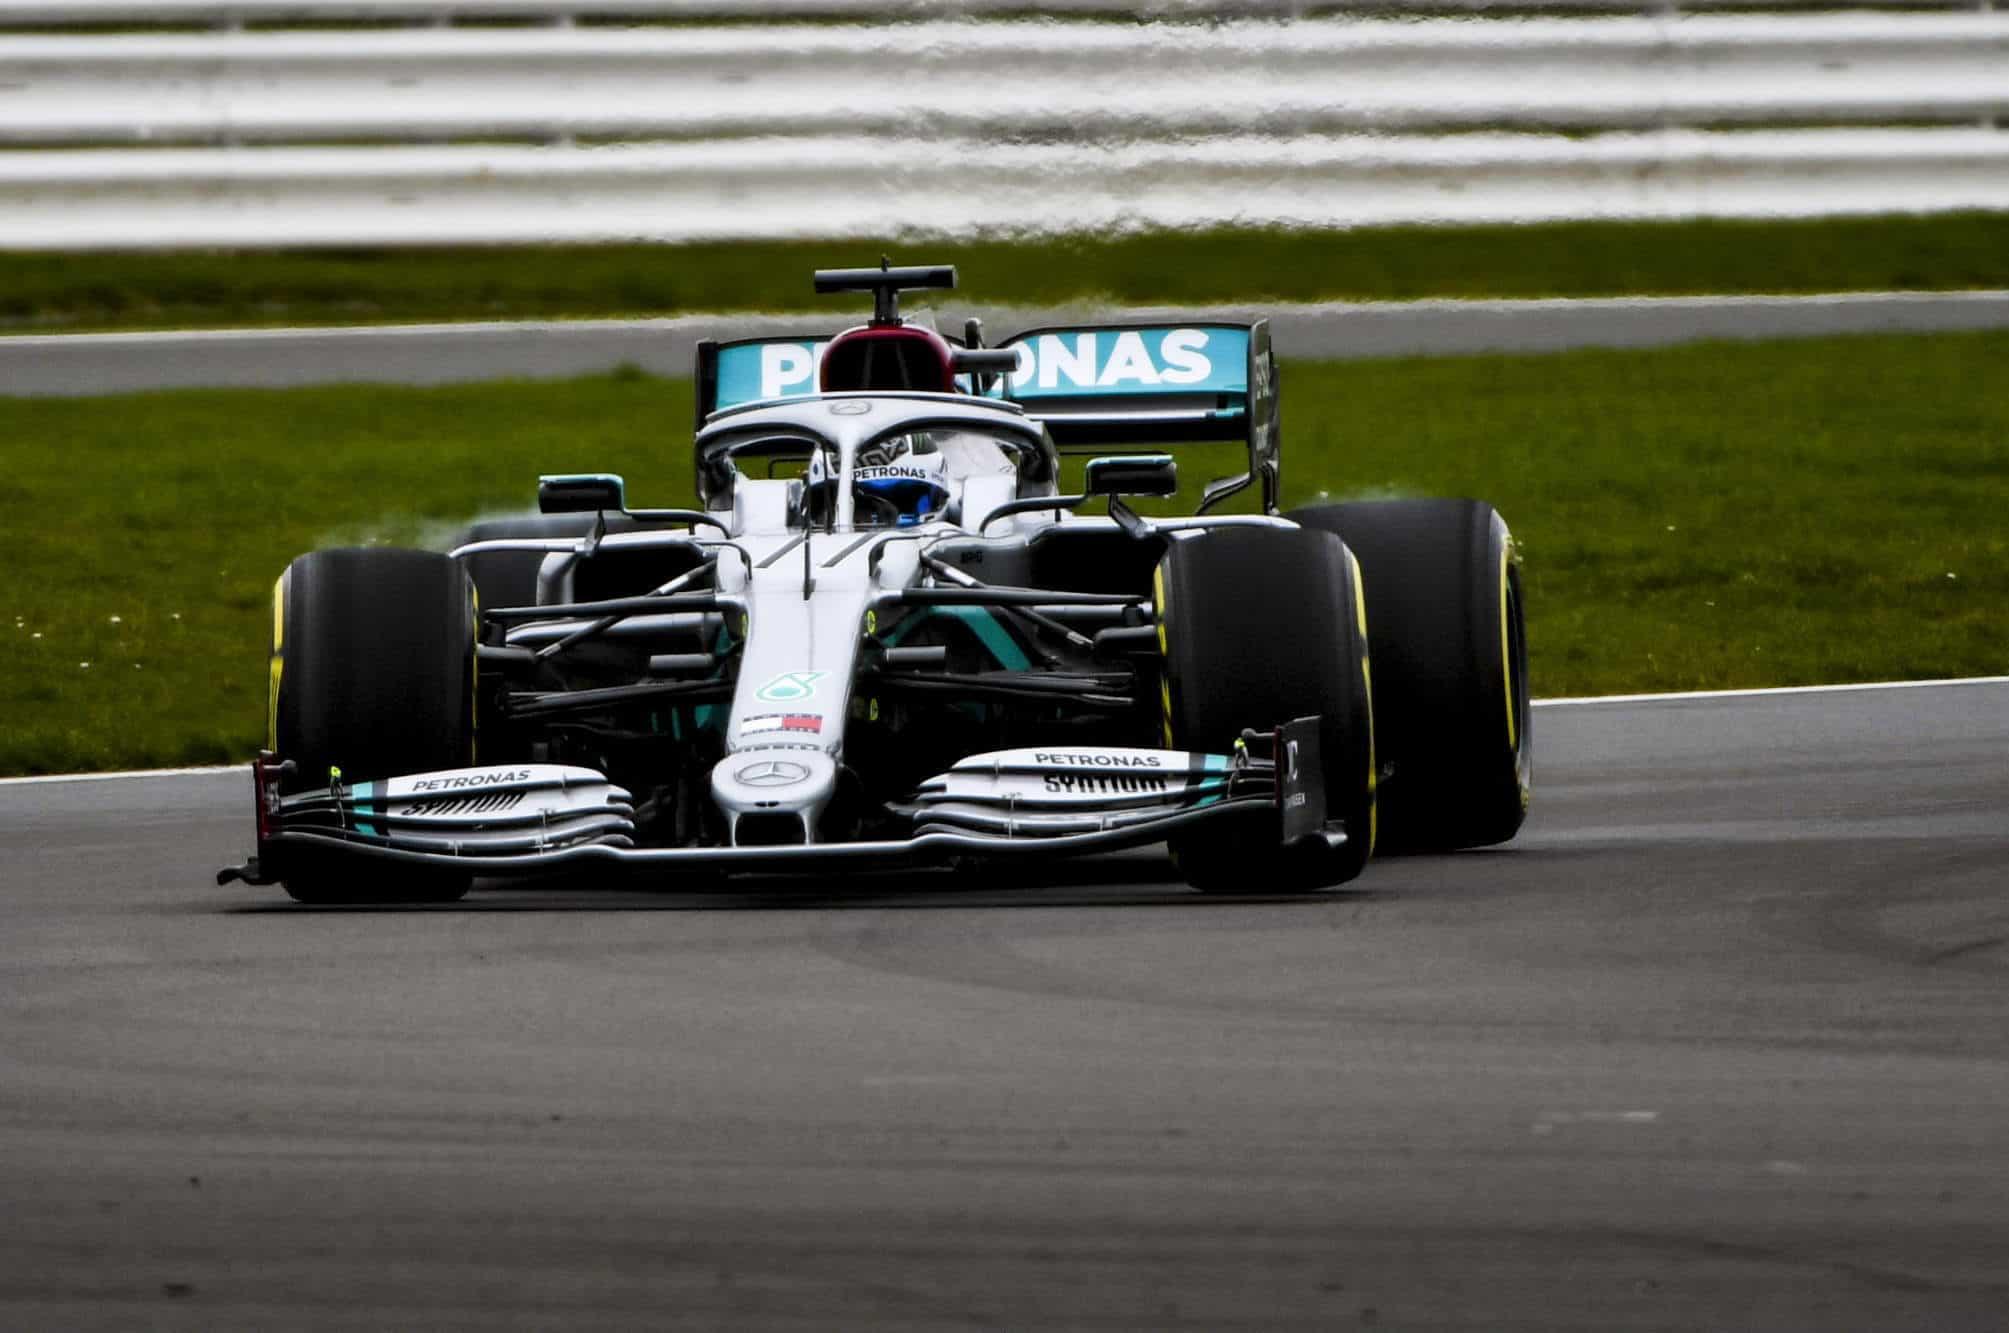 2020 F1 Mercedes F1 W11 first shakedown Silverstone Hamilton 2000px Photo Daimler